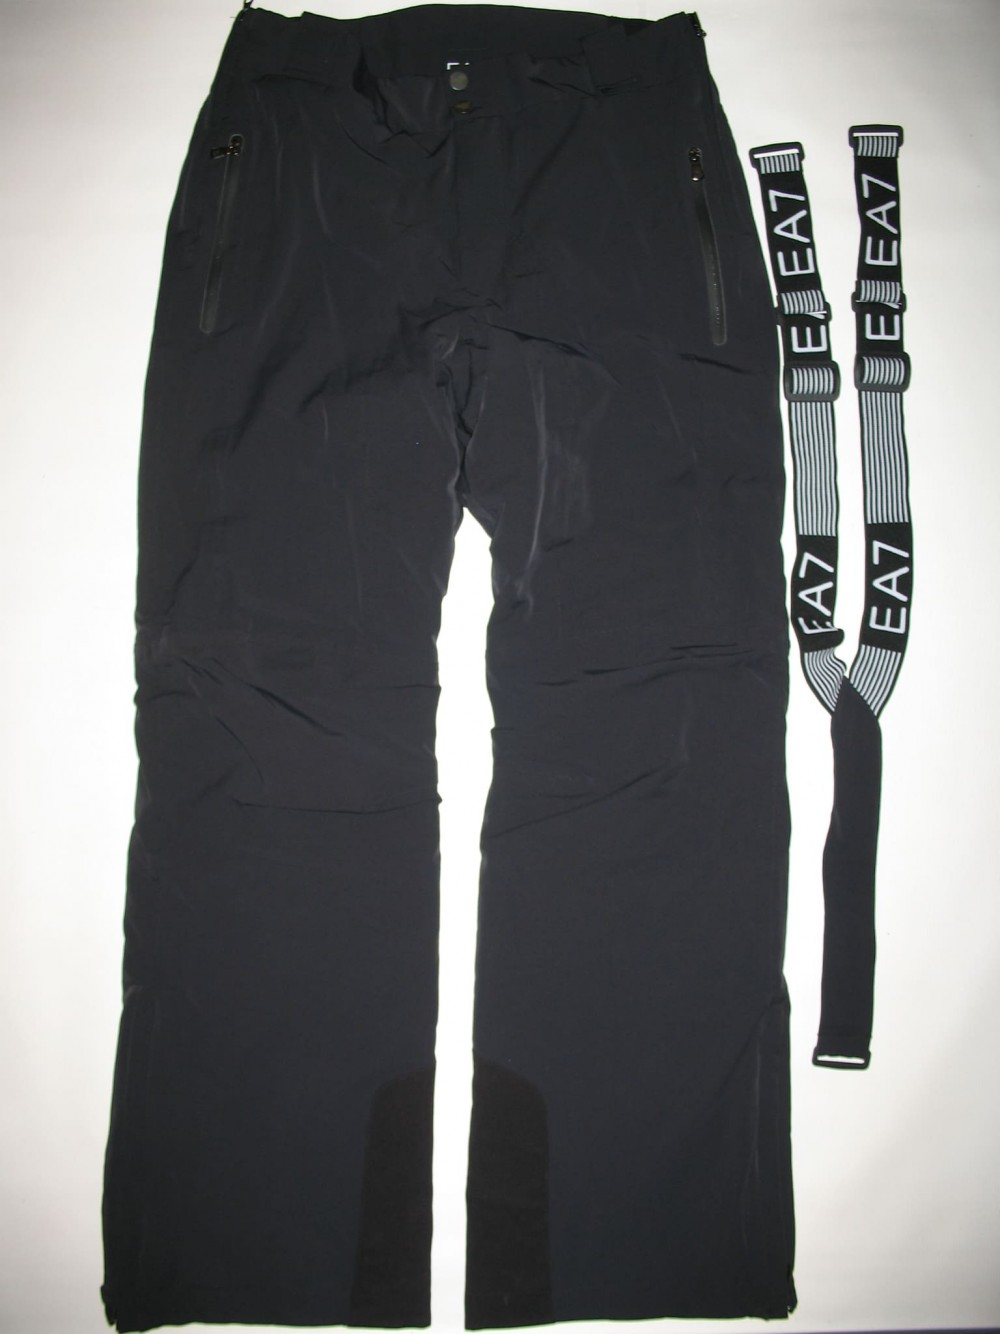 Штаны EA7 emporio armani ski bib pants ( размер XL) - 2